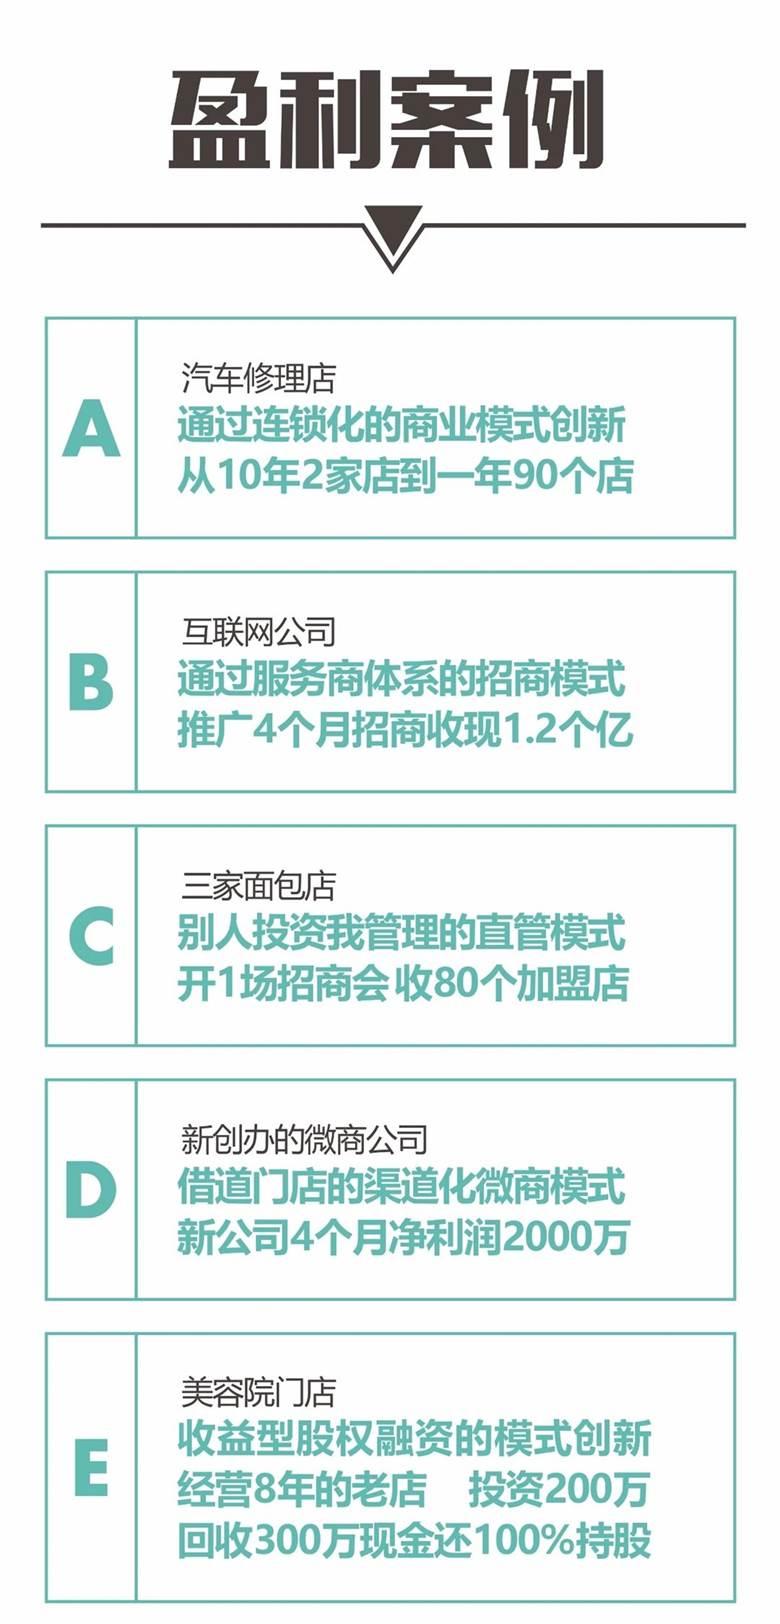 http://www.huodongxing.com/file/20191113/1063603644976/793659462063214.jpg